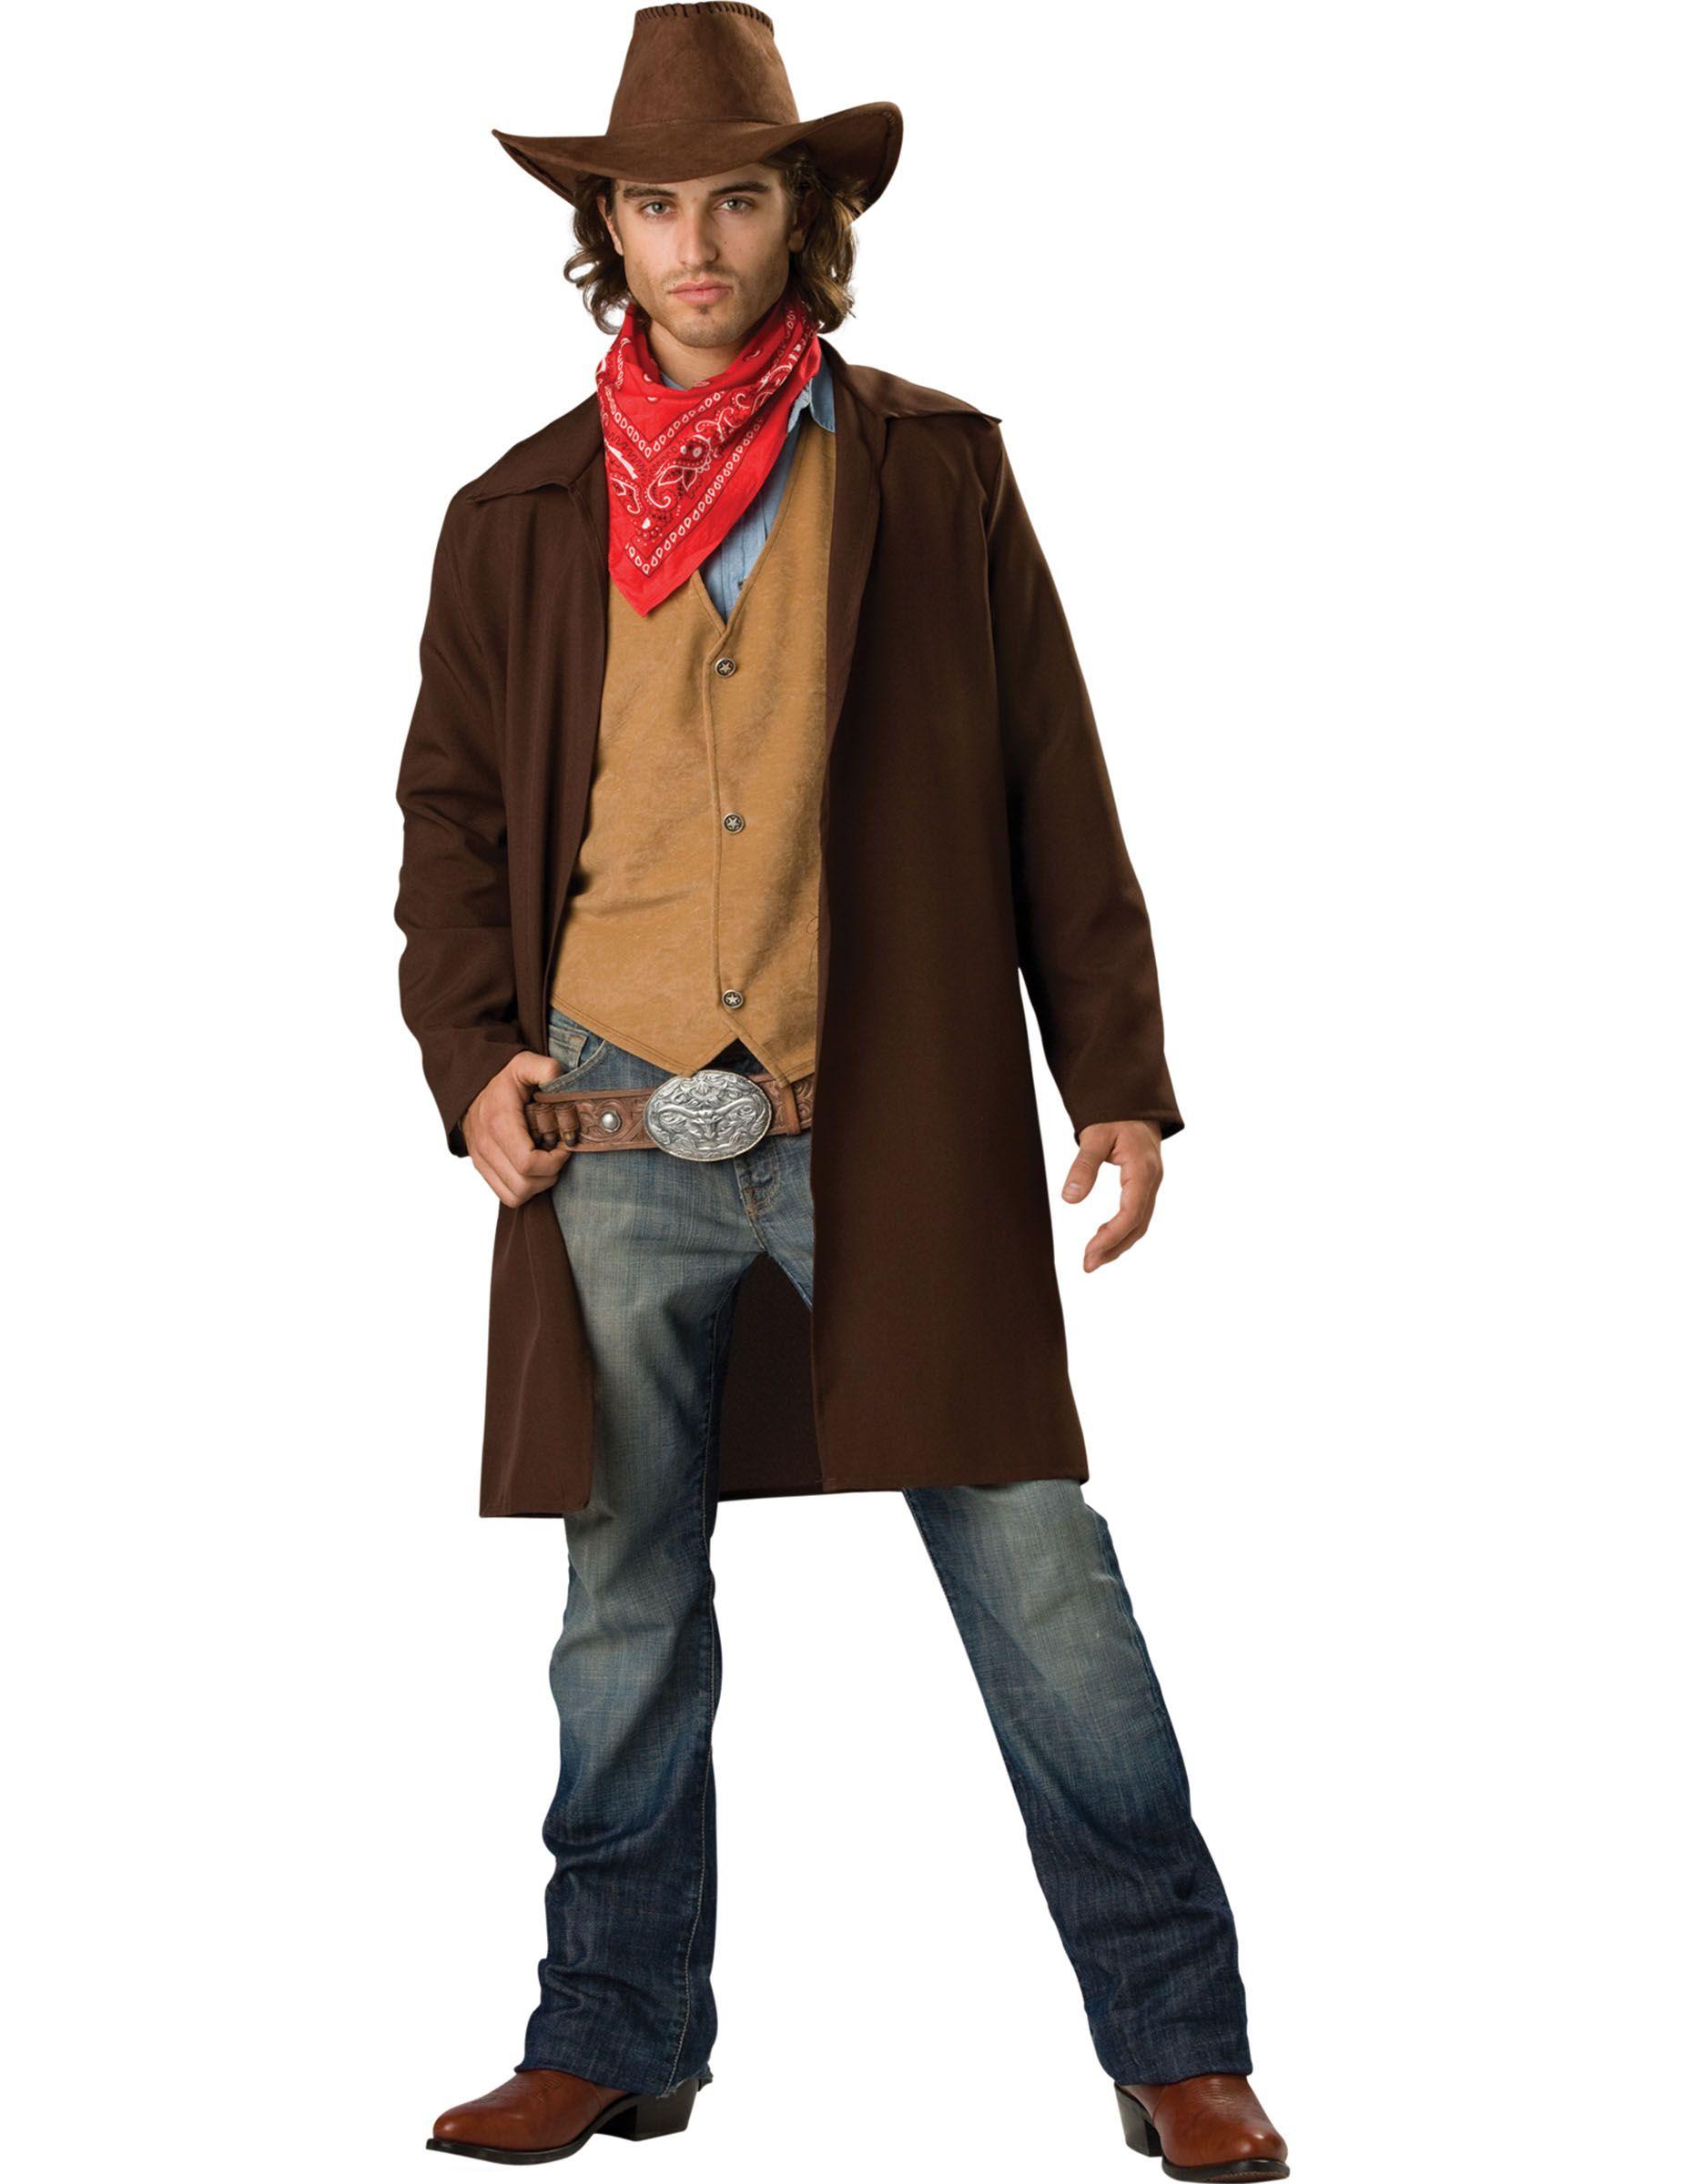 Disfraz vaquero para hombre Premium  Este disfraz de cowboy incluye  chaqueta b0277e5b4e4